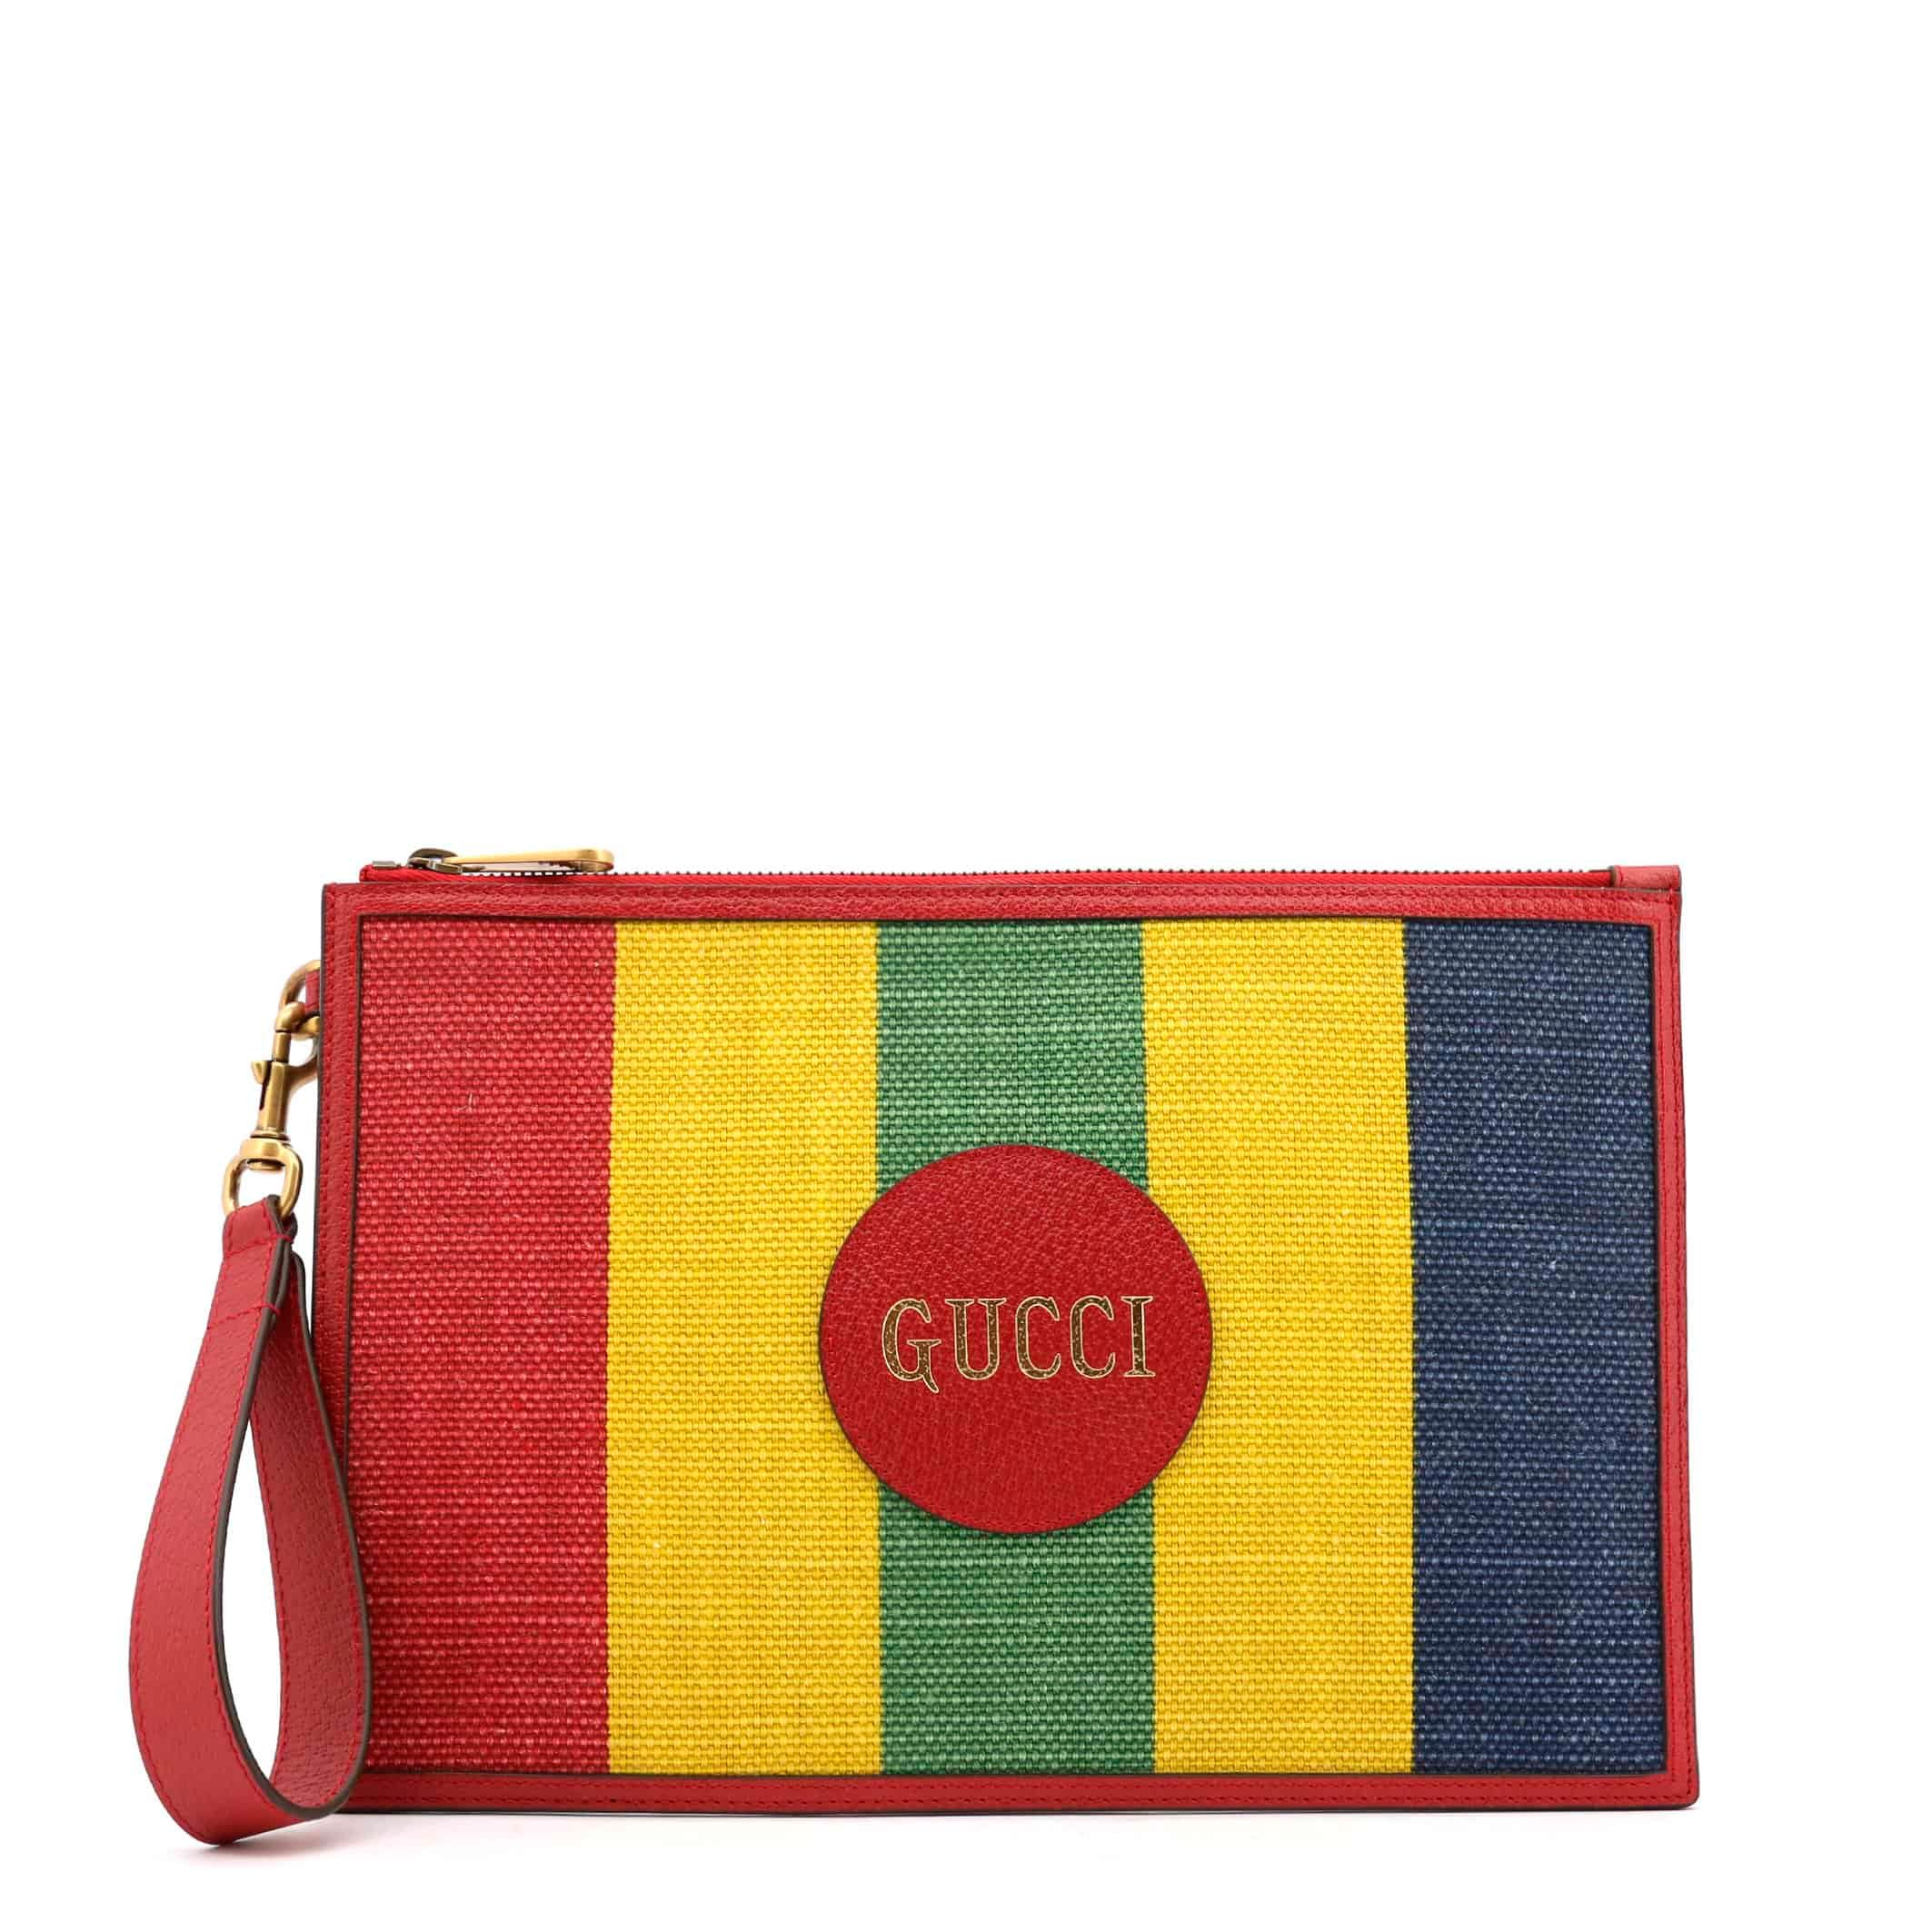 Gucci – 625602_20SAT – Rood Designeritems.nl